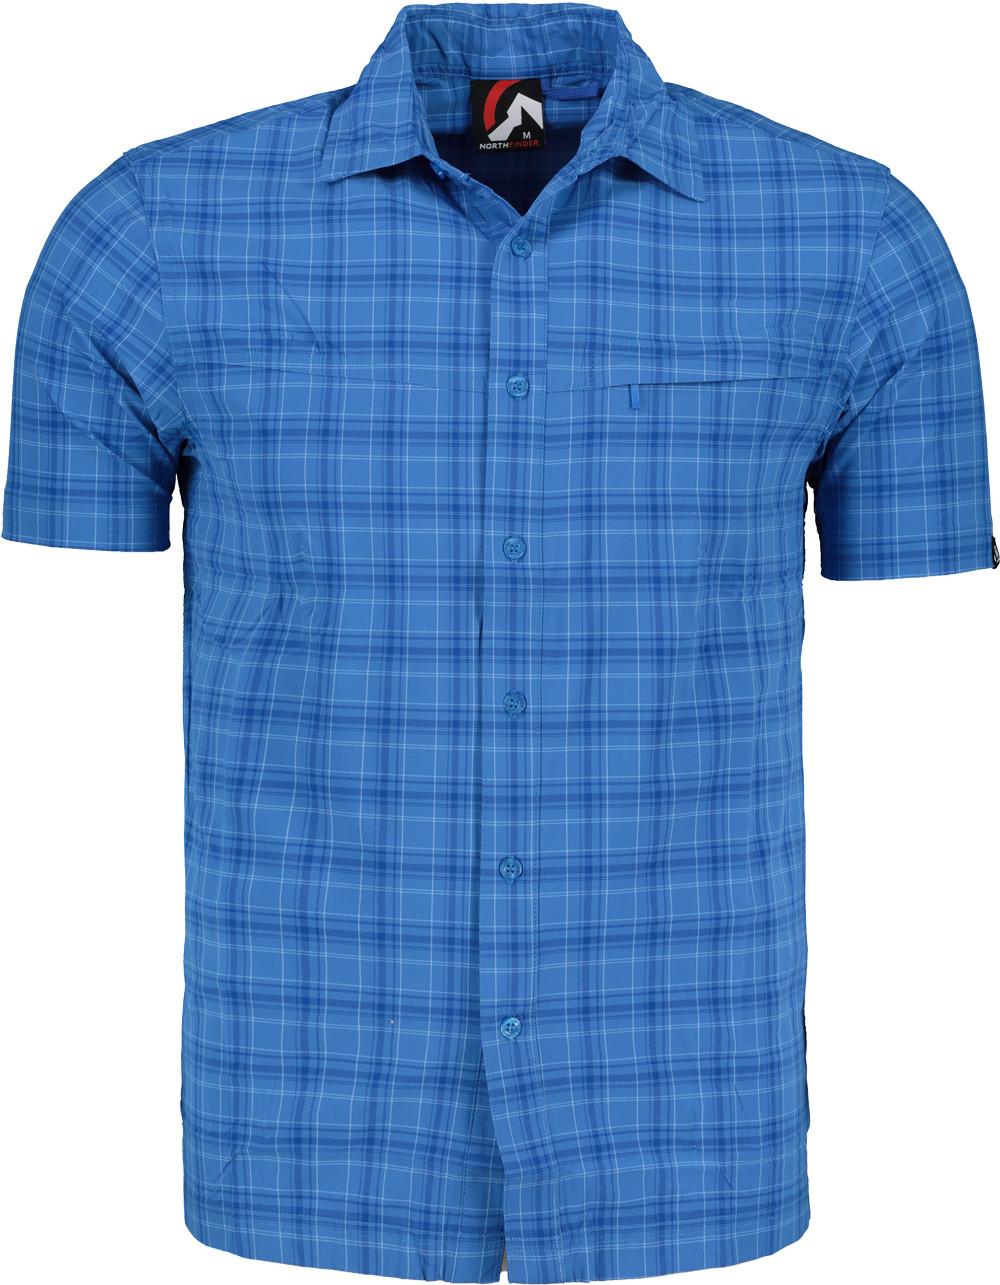 Men's shirt NORTHFINDER SMINSON